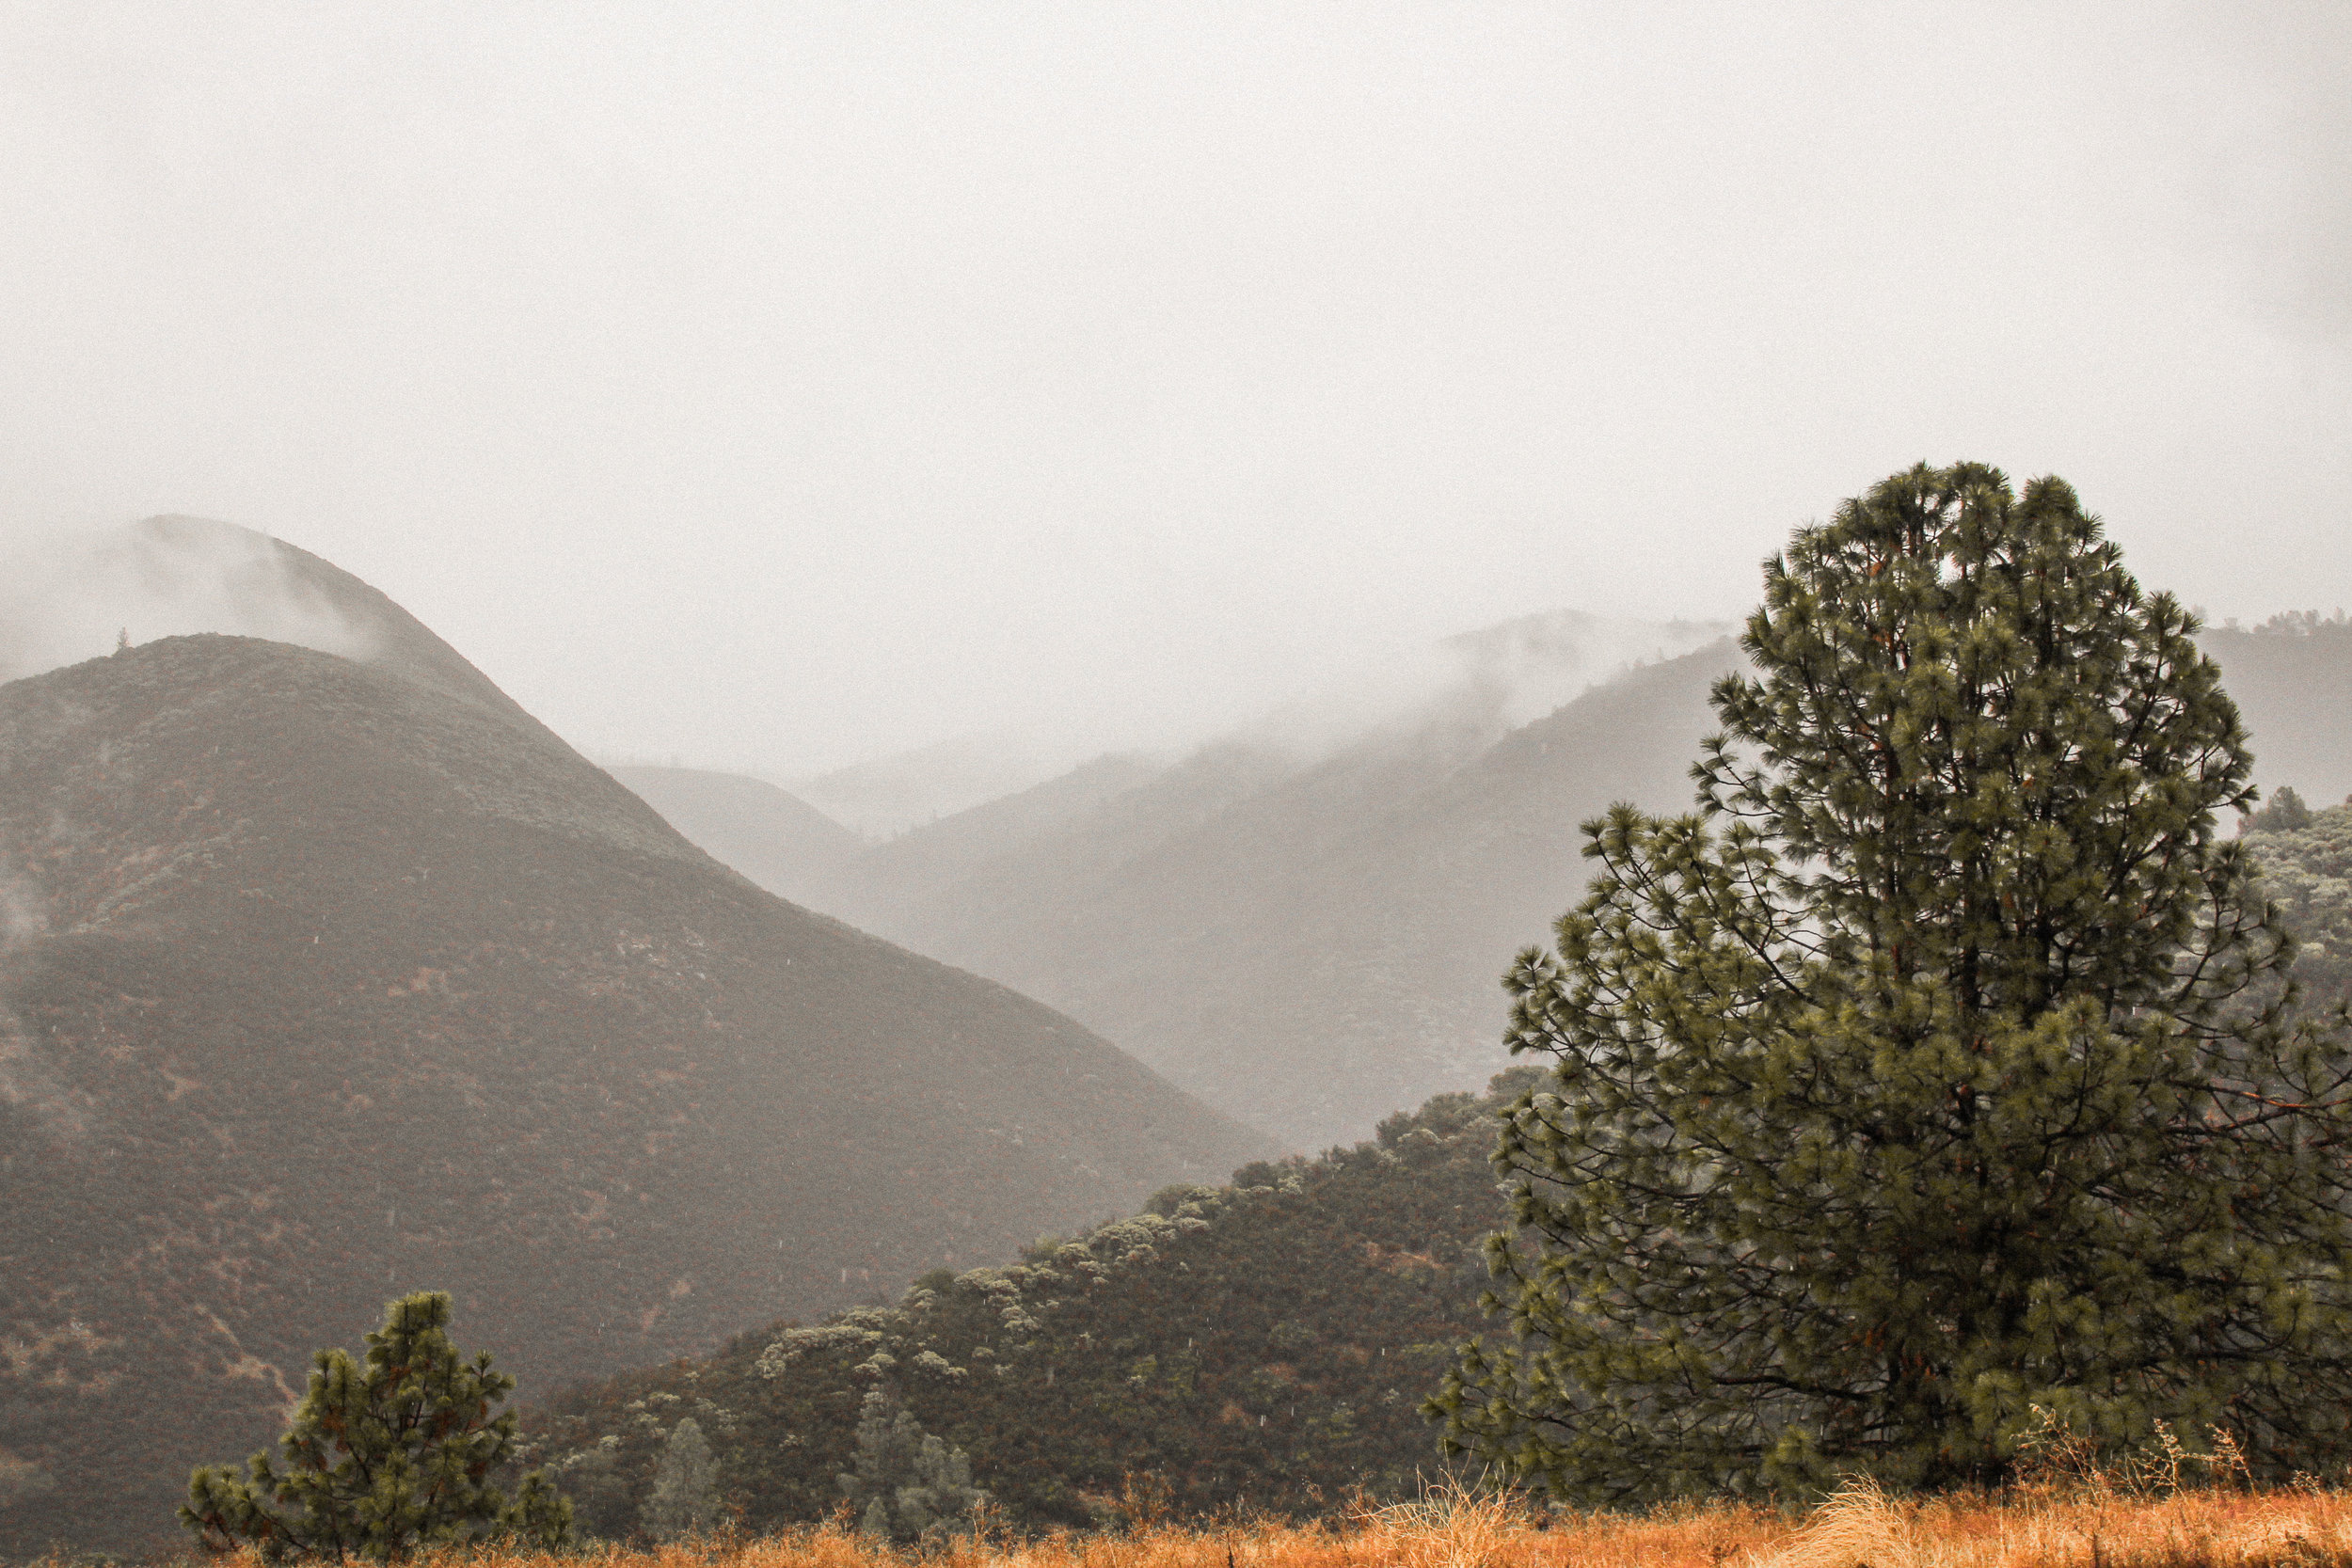 Snowy Hilltops near El Portal, California